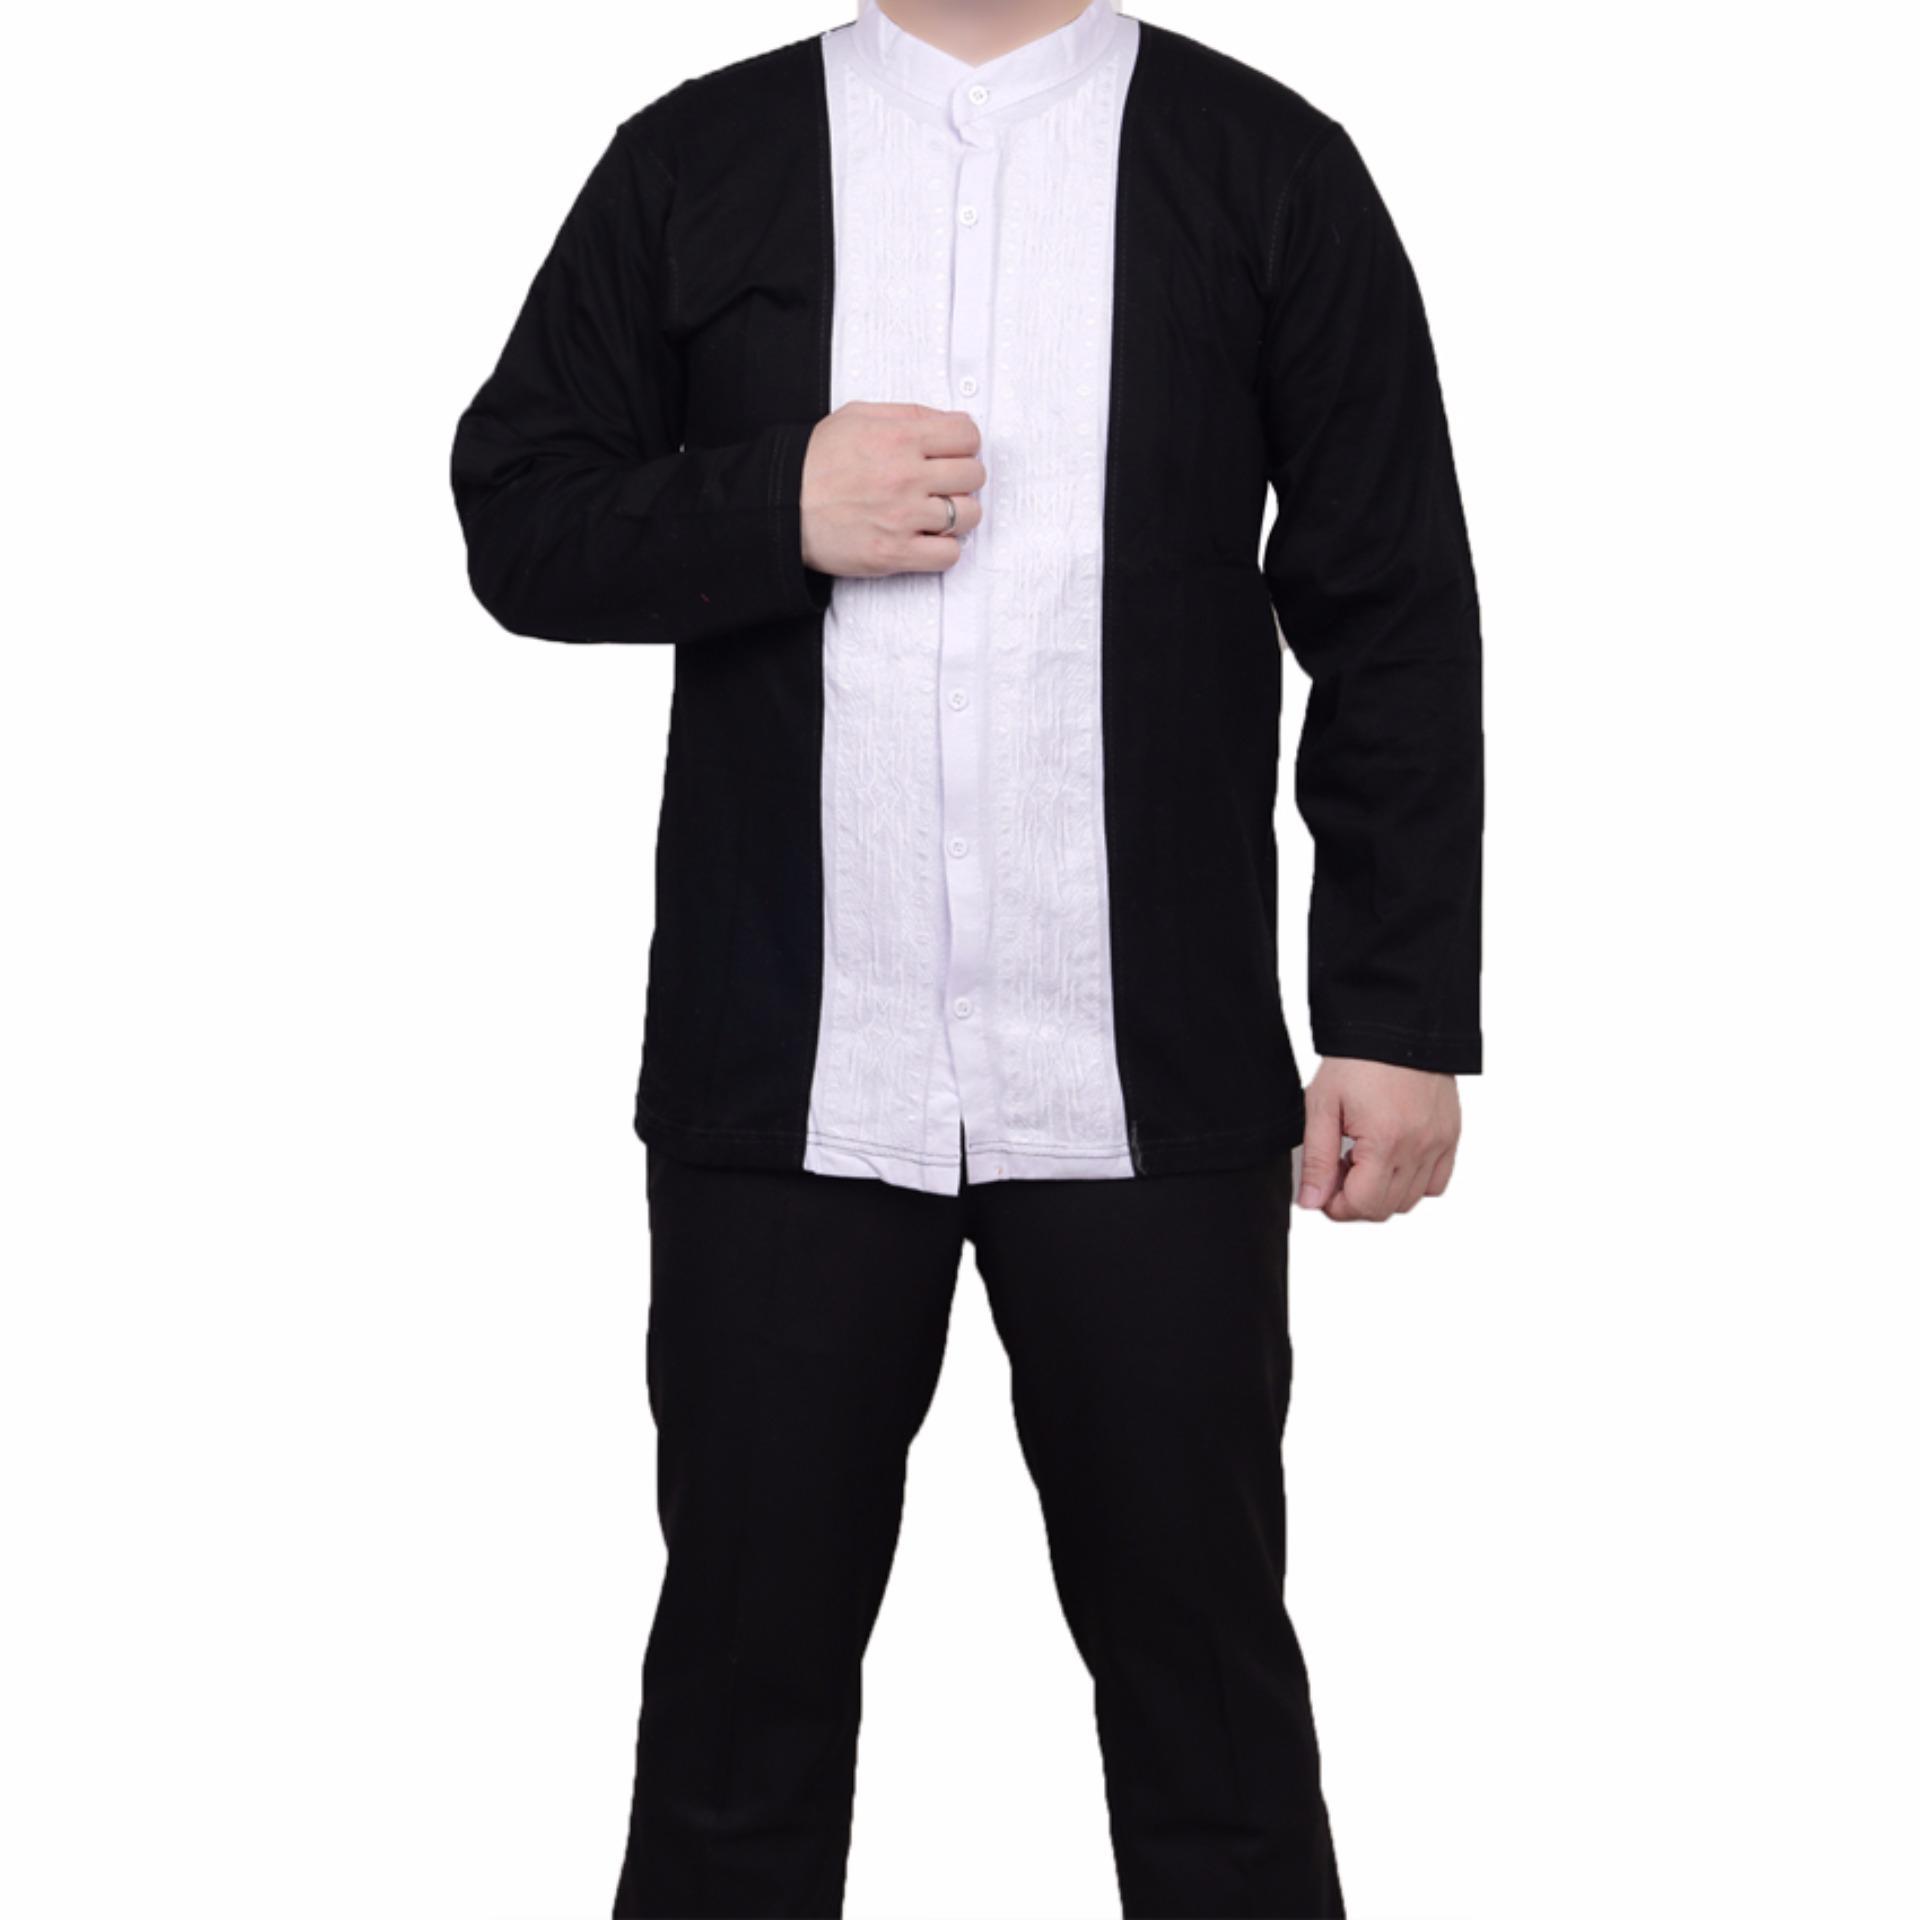 ormano-baju-koko-muslim-batik-lengan-panjang-lebaran-zo17-kk56-kemeja-fashion-pria-hitam-1495176152-69063522-d3e72eb3999f573e46605ffa297725cc.jpg